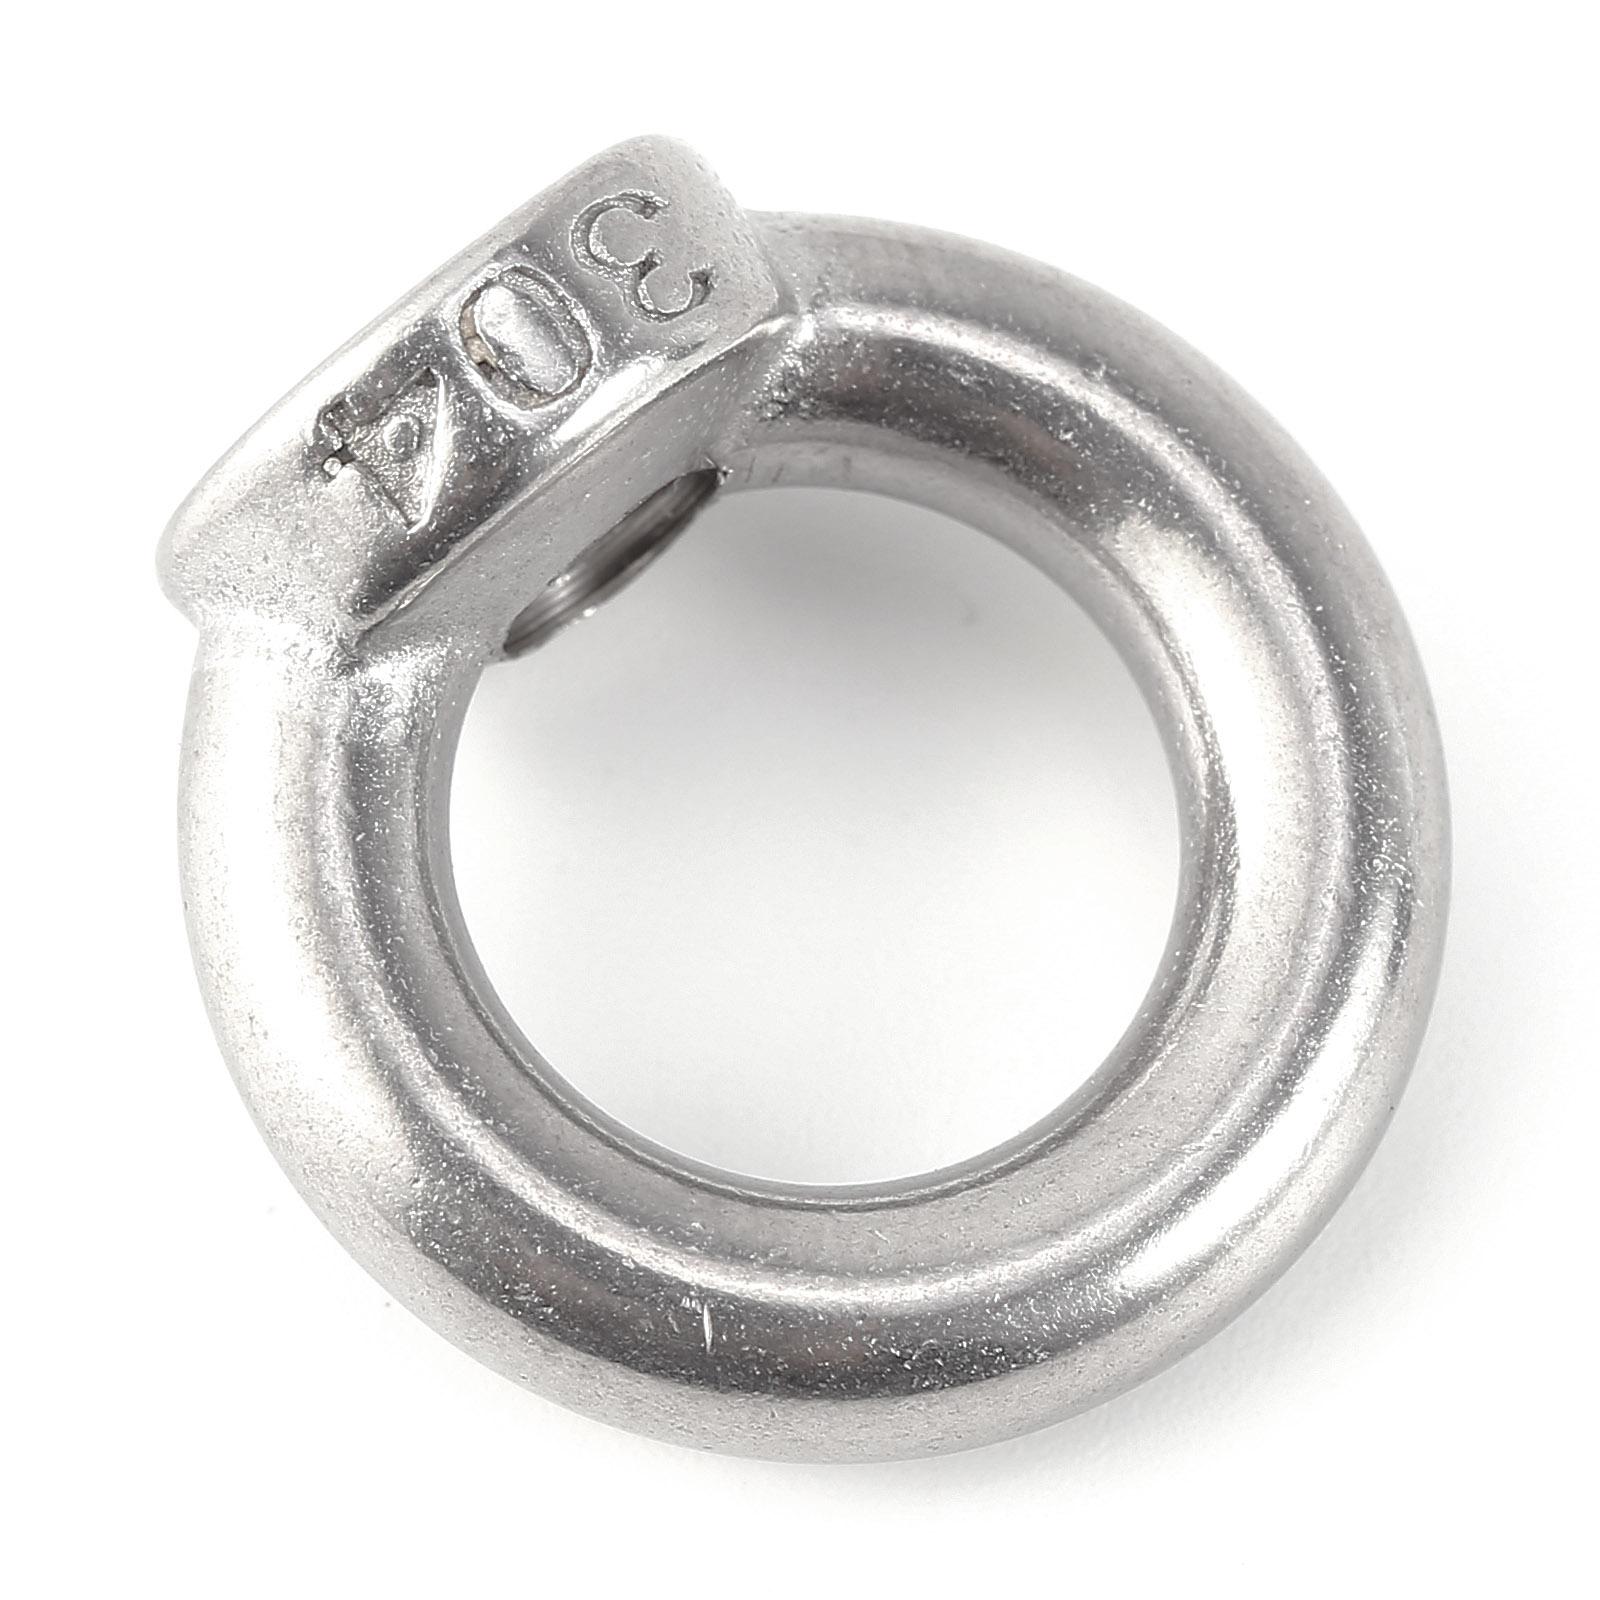 ringmutter ringschrauben edelstahl m6 m8 m10 ringmuttern rostfrei ring se ebay. Black Bedroom Furniture Sets. Home Design Ideas